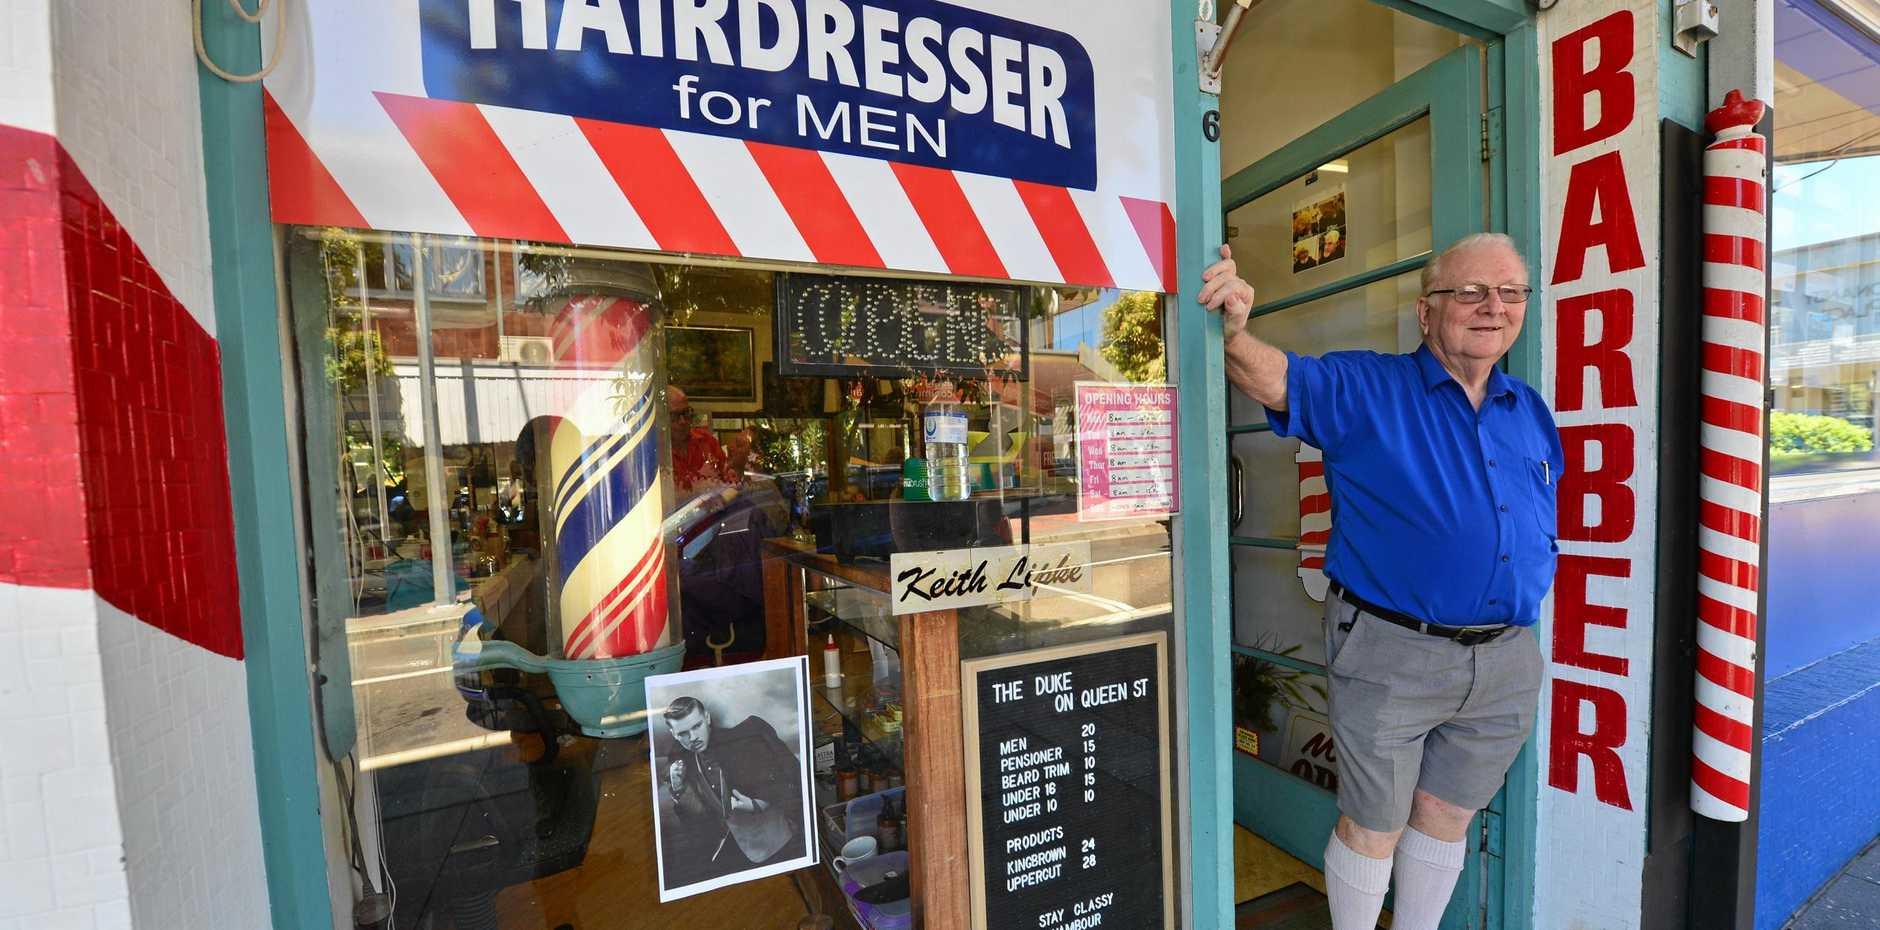 Barber Keith Lipke is retiring after 61 years.